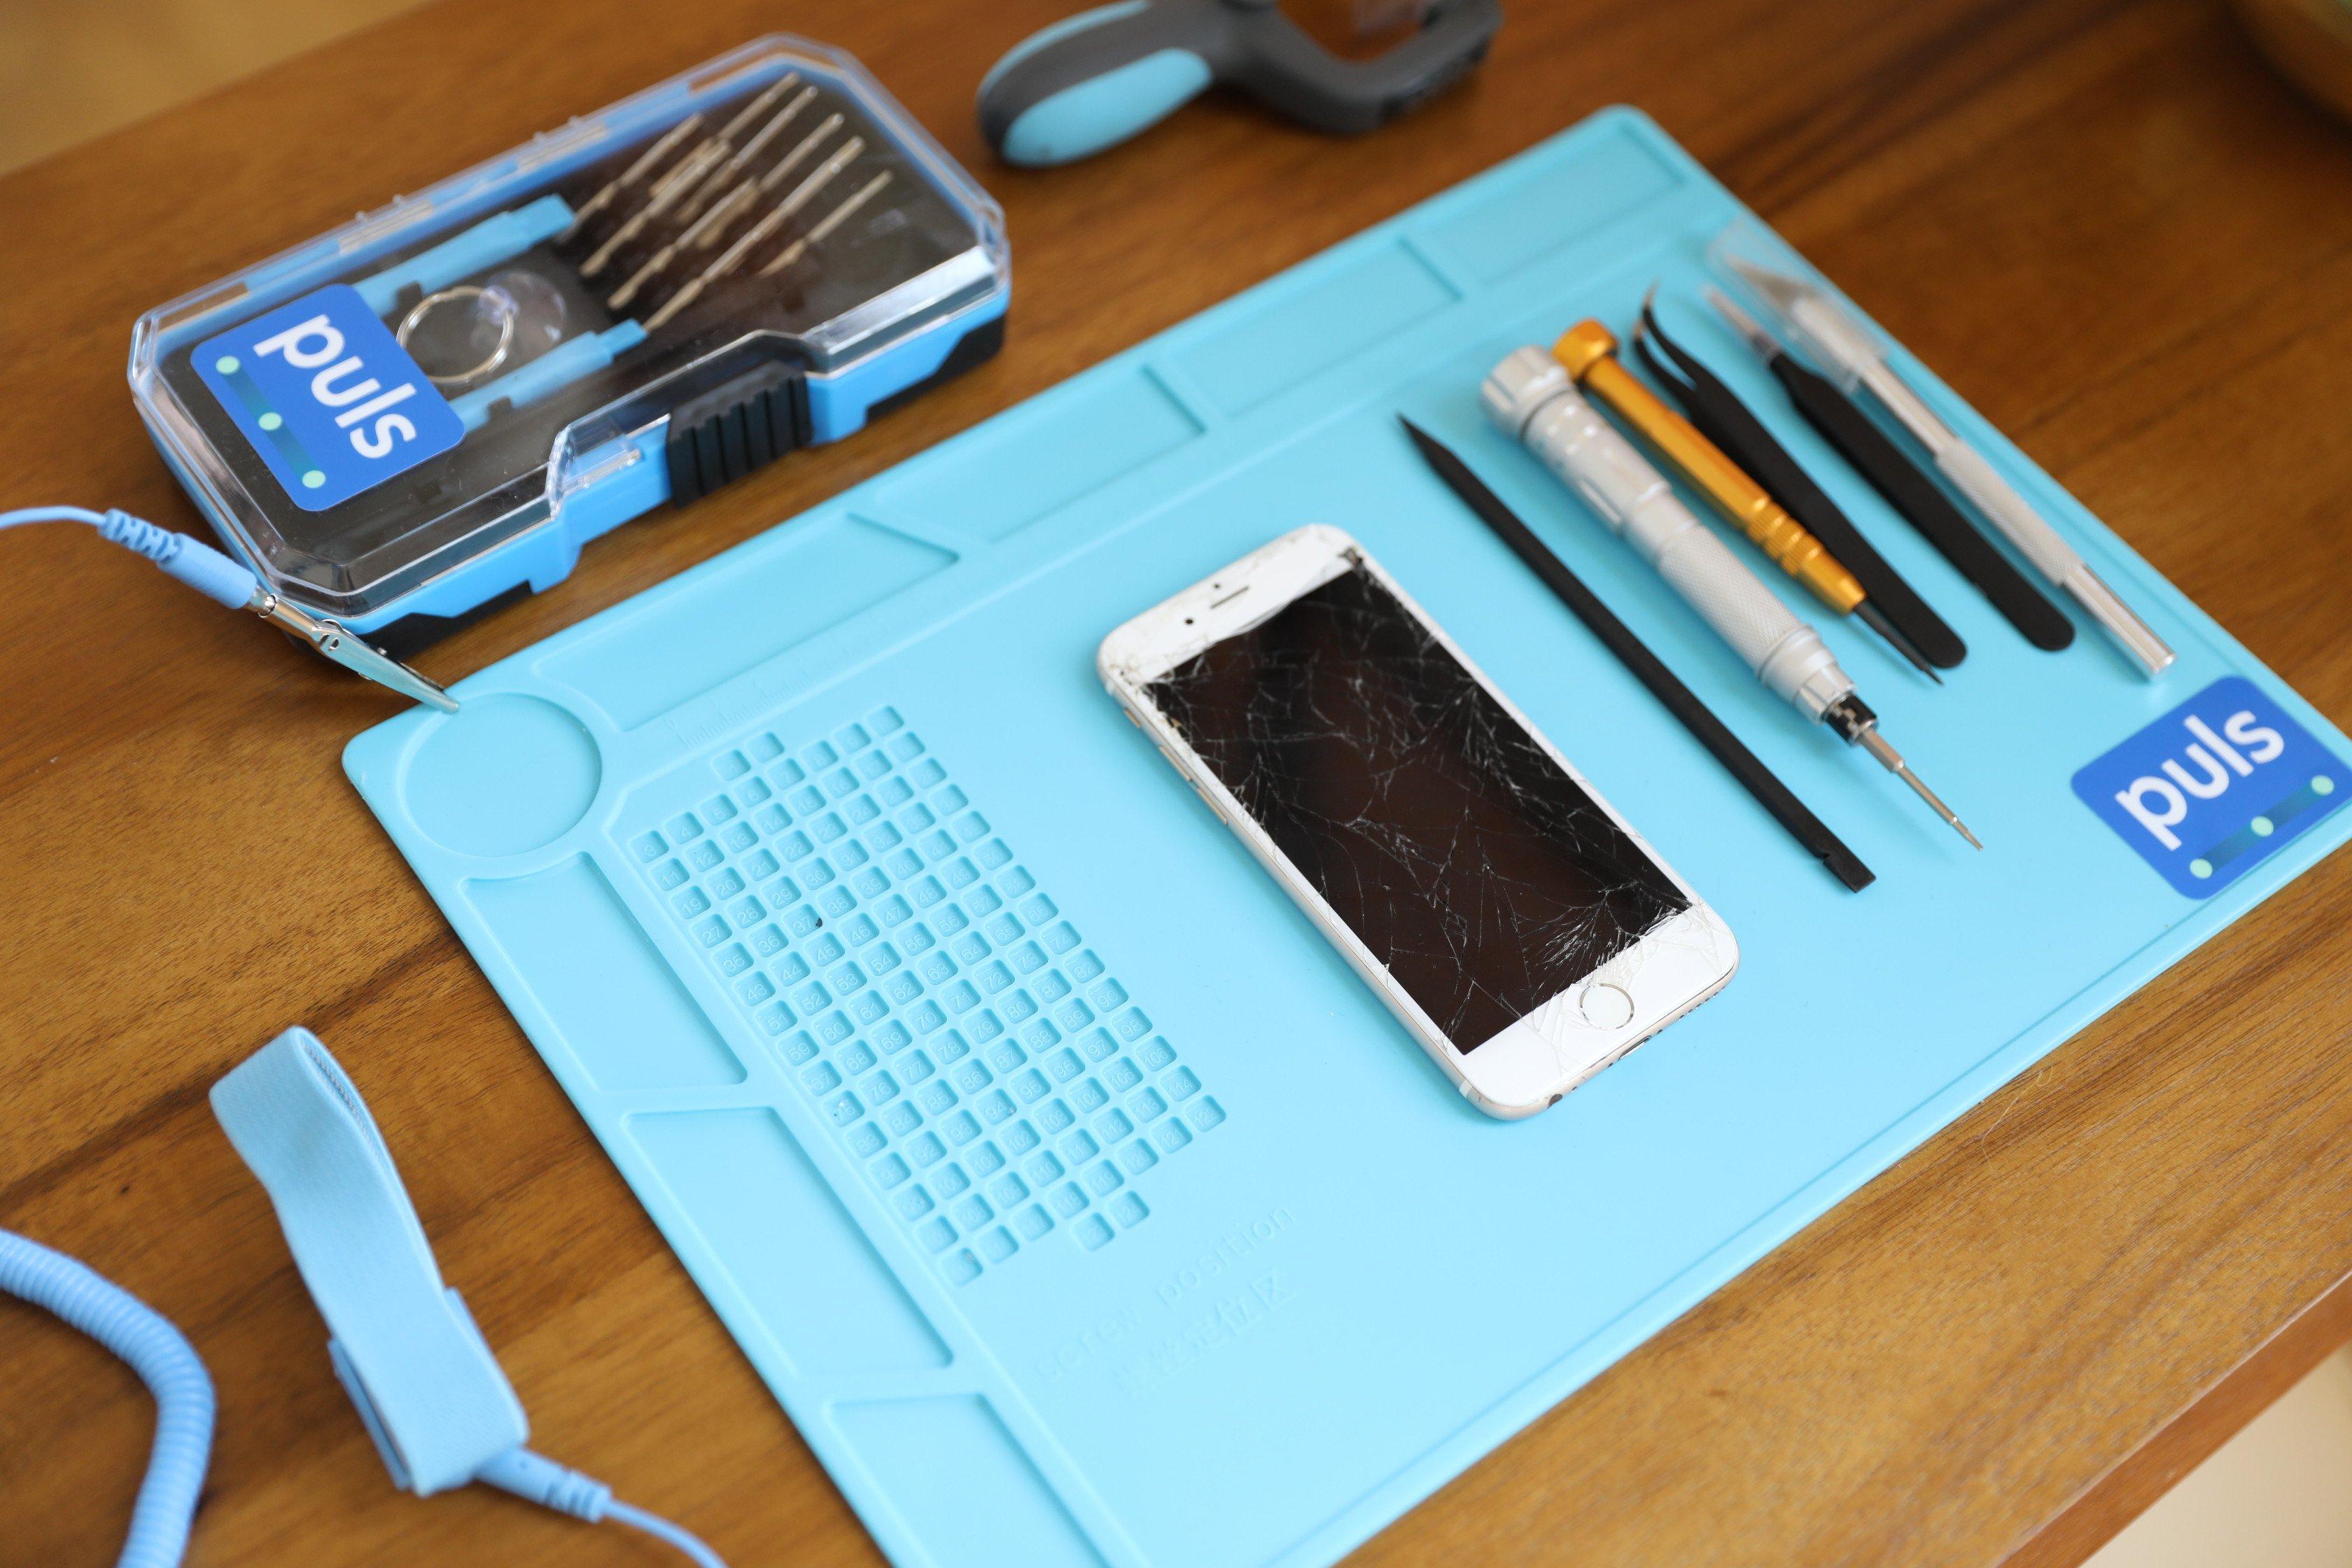 Puls iPhone screen repair